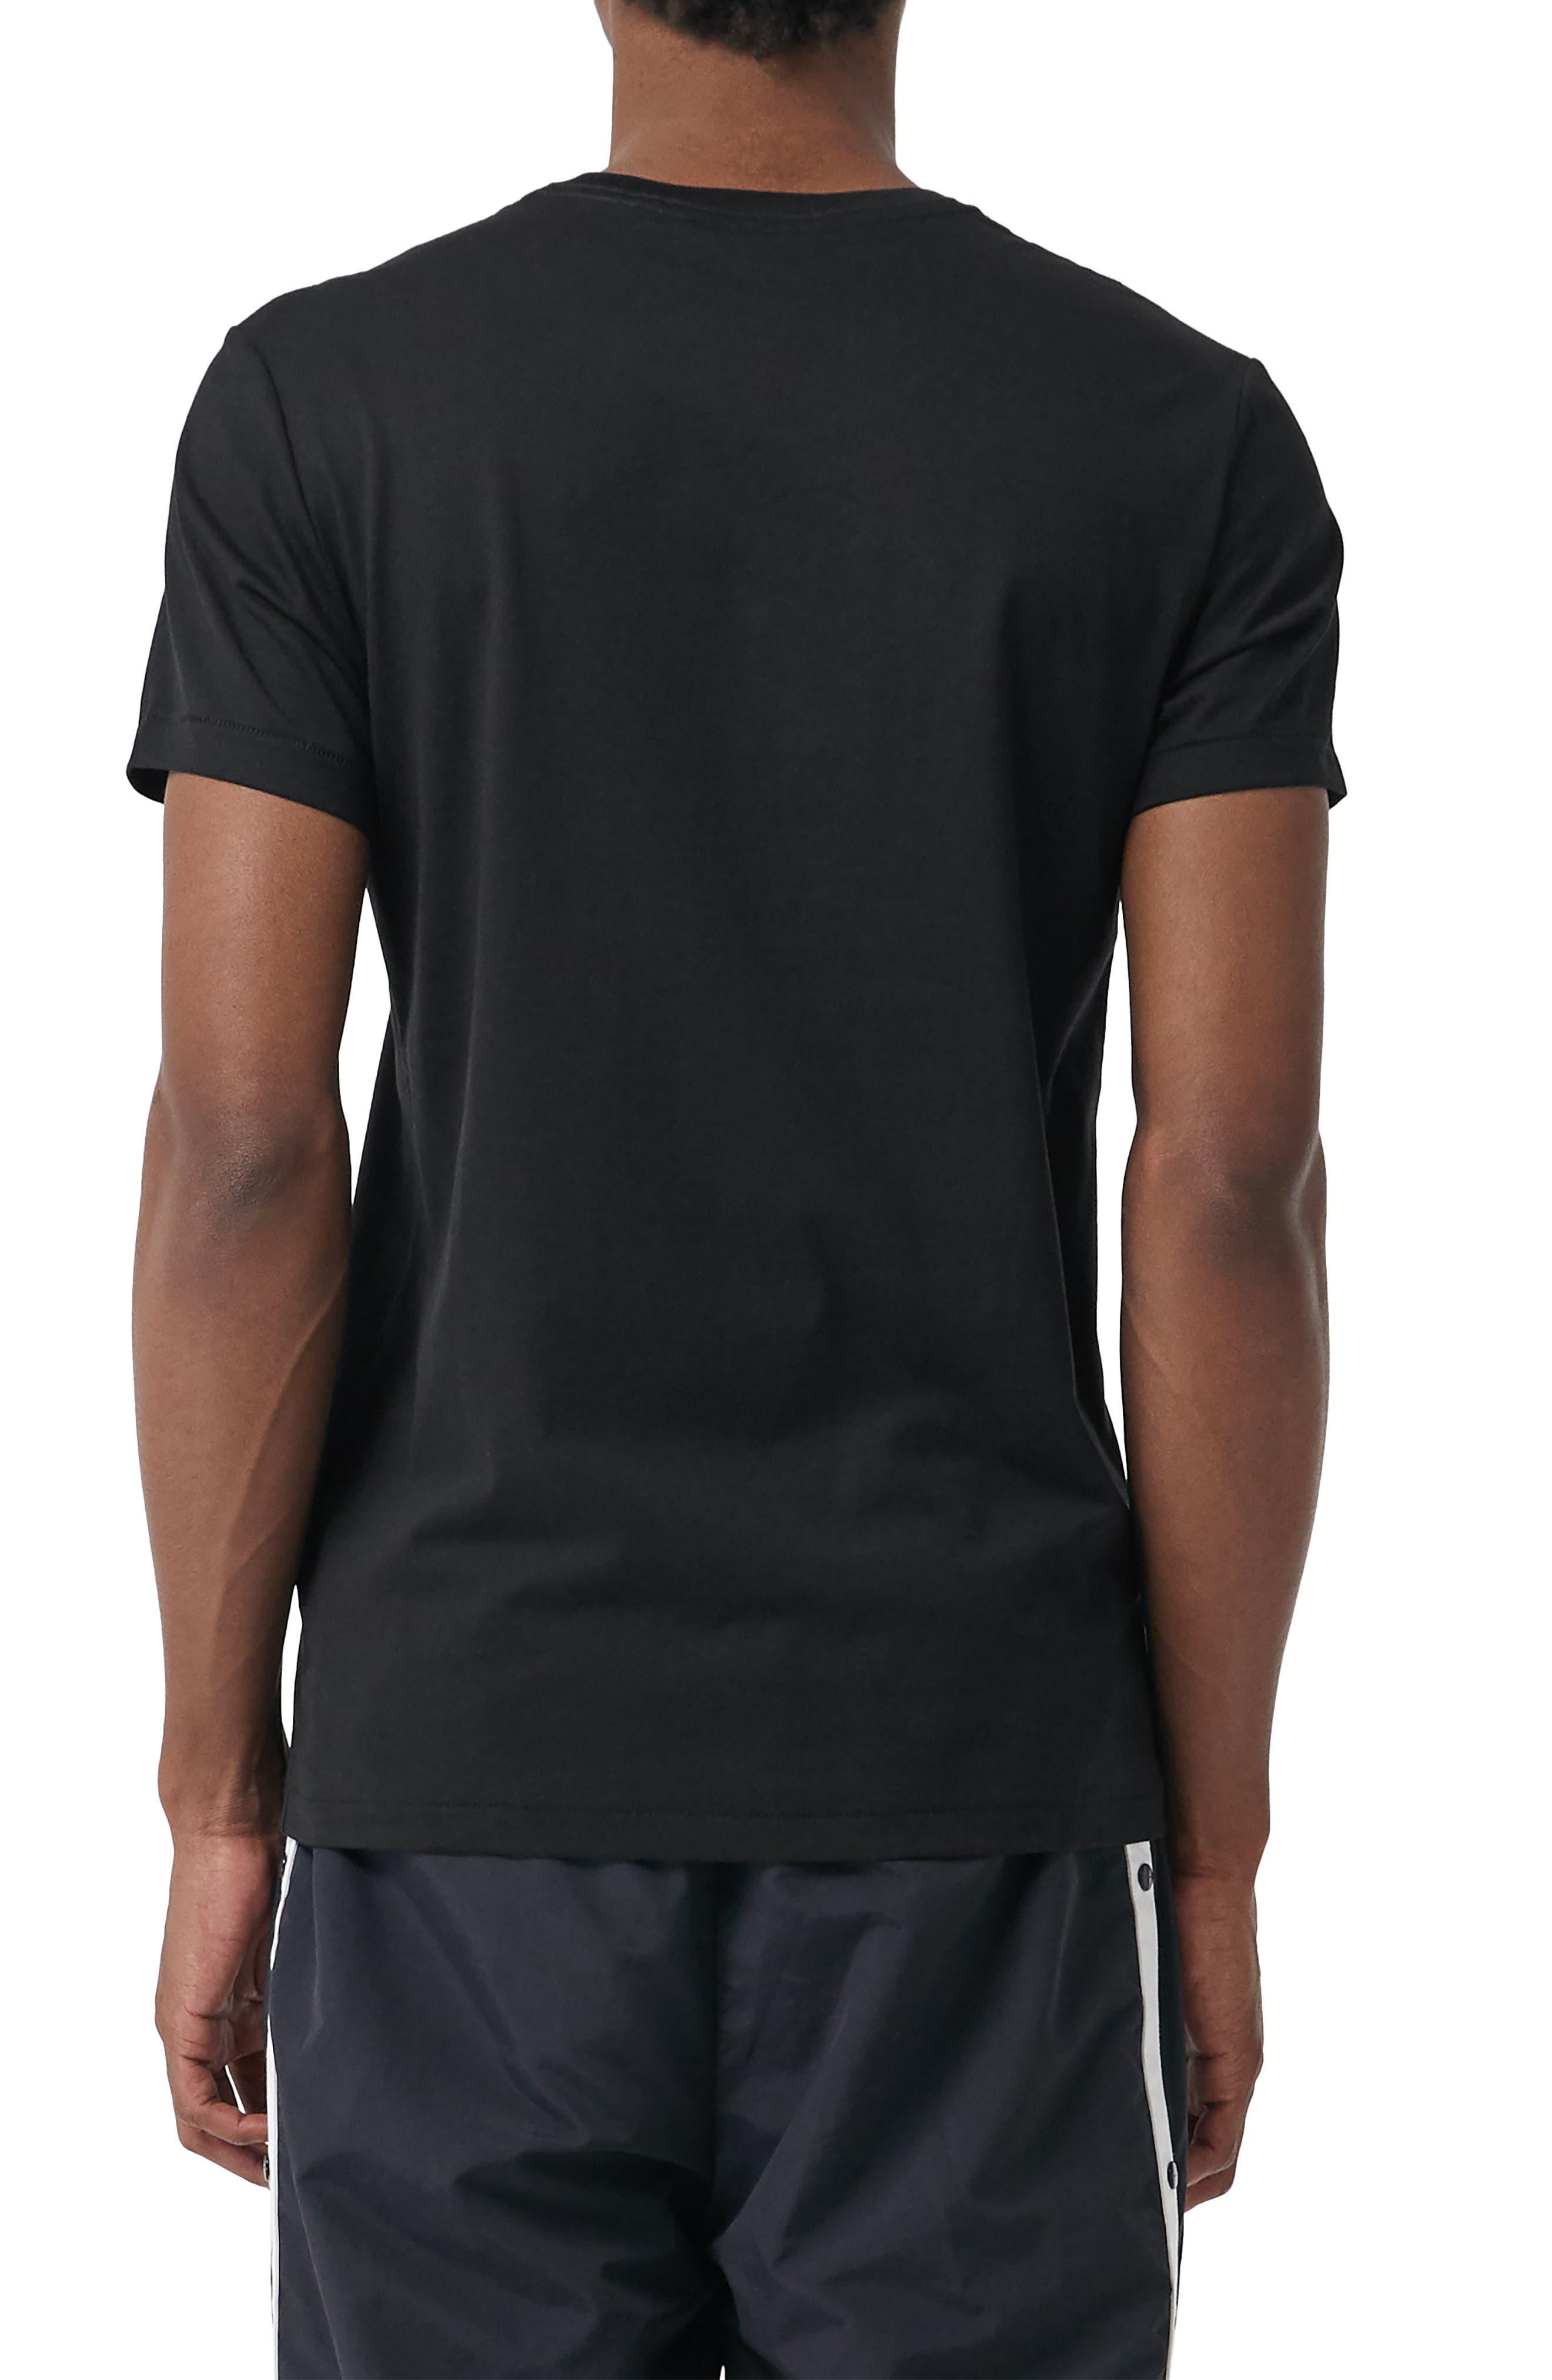 BURBERRY, Logo Embroidered Crewneck T-shirt, Alternate thumbnail 2, color, TRUE BLACK